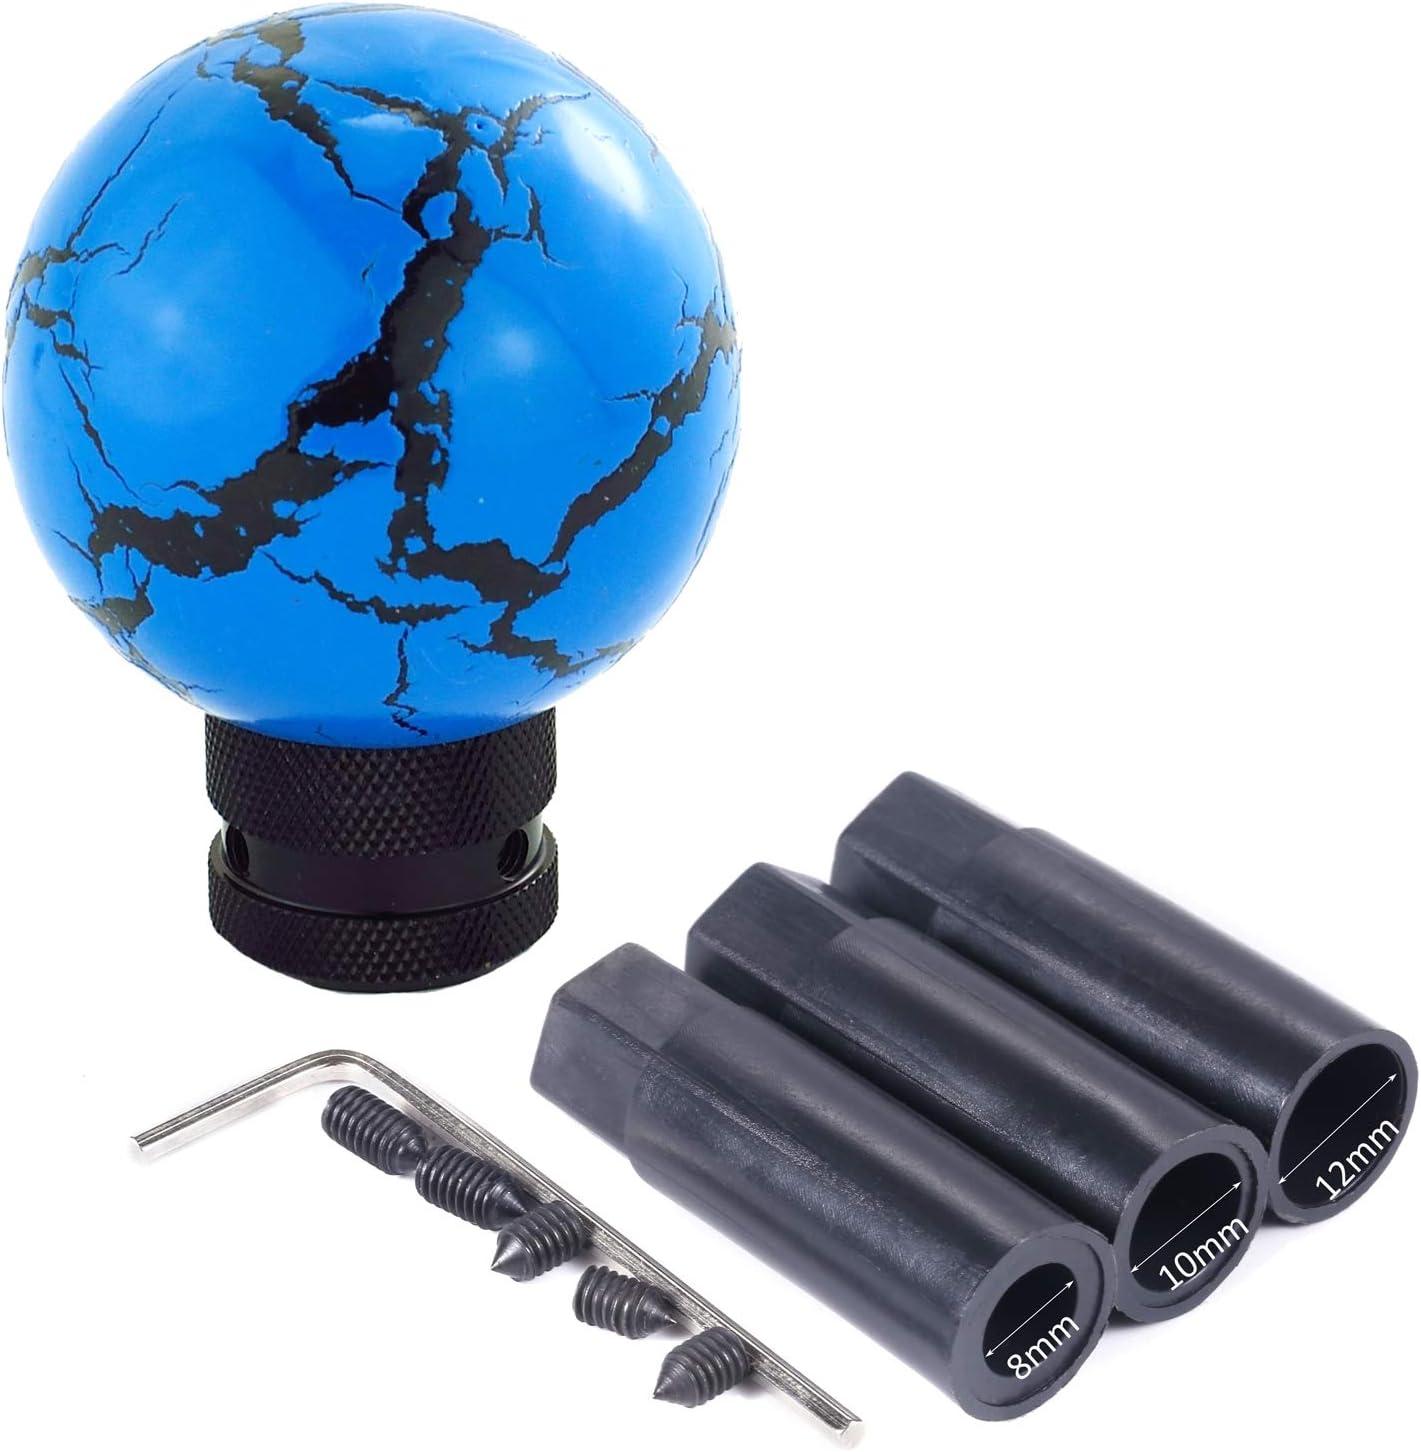 Blue Bashineng Gear Shift Knob Ball Shape Shifter Handle Knobs Fit Universal Manual Automatic Cars